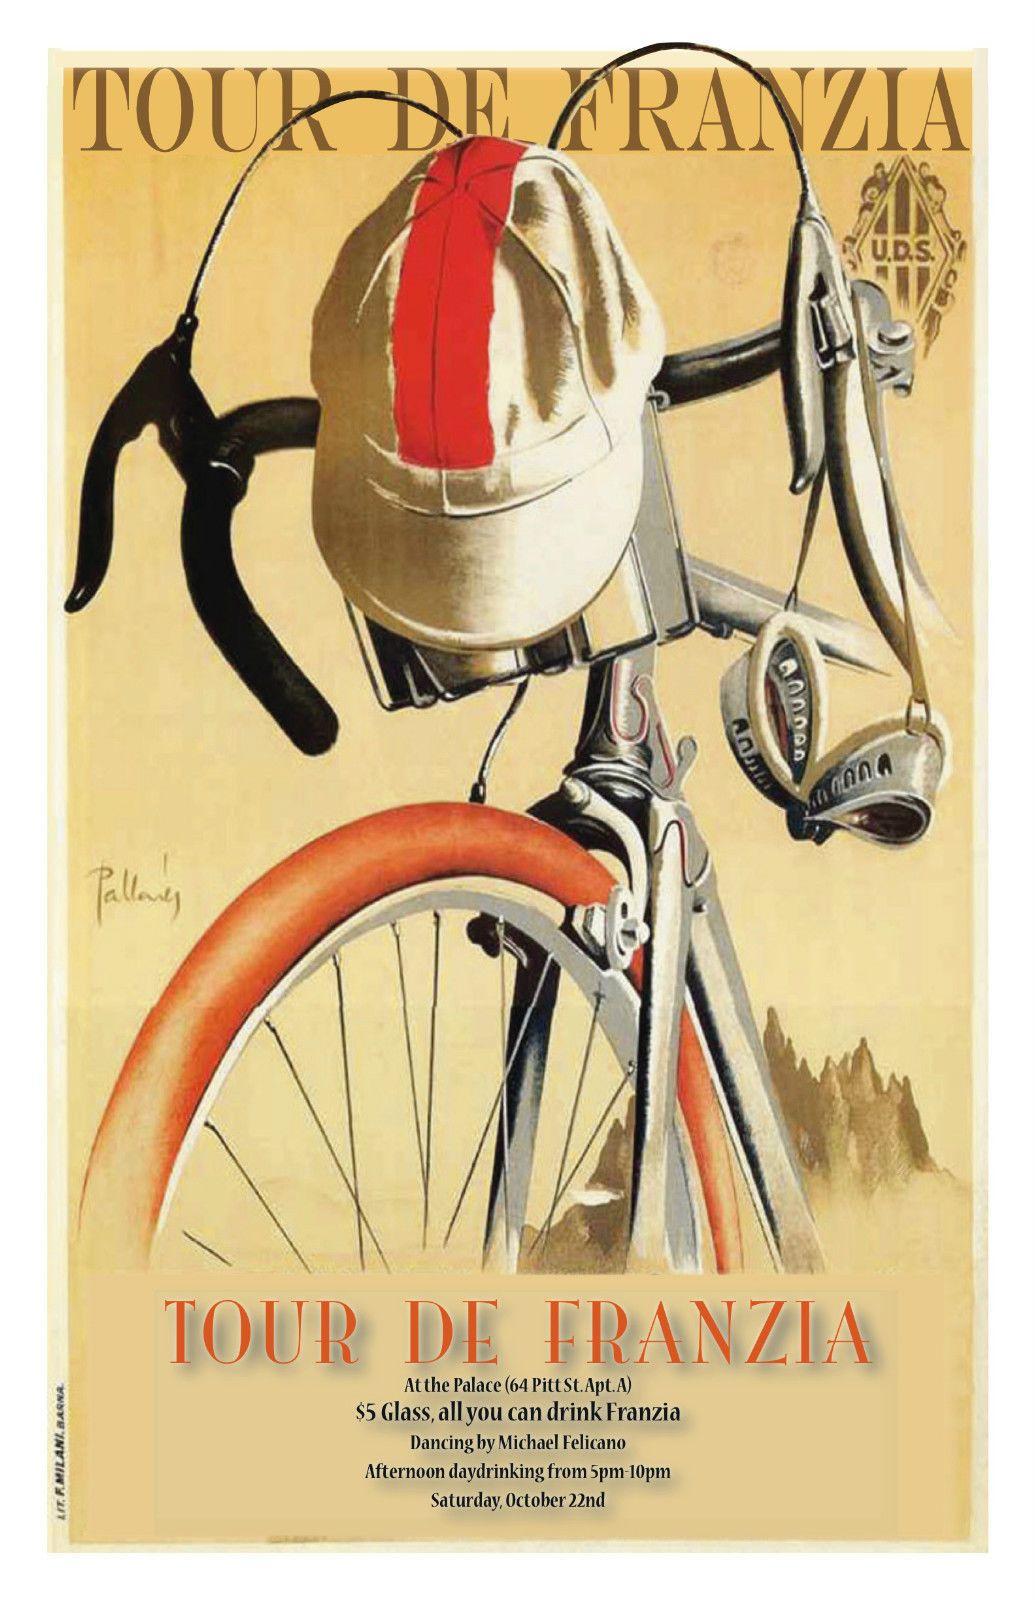 "Tour de france vintage poster poster 8"" x 6"" metal sign no ..."